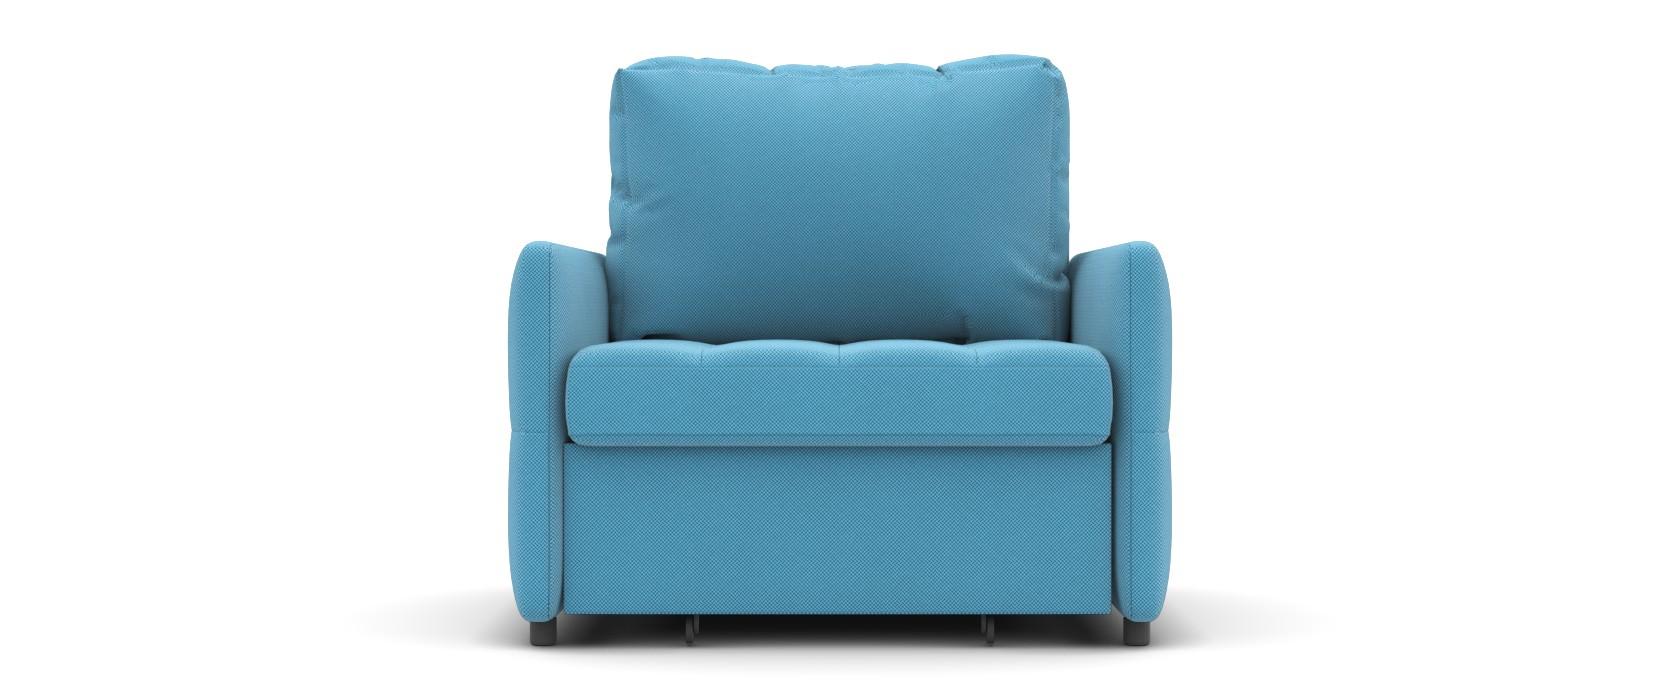 Раскладное кресло Gracia - Pufetto